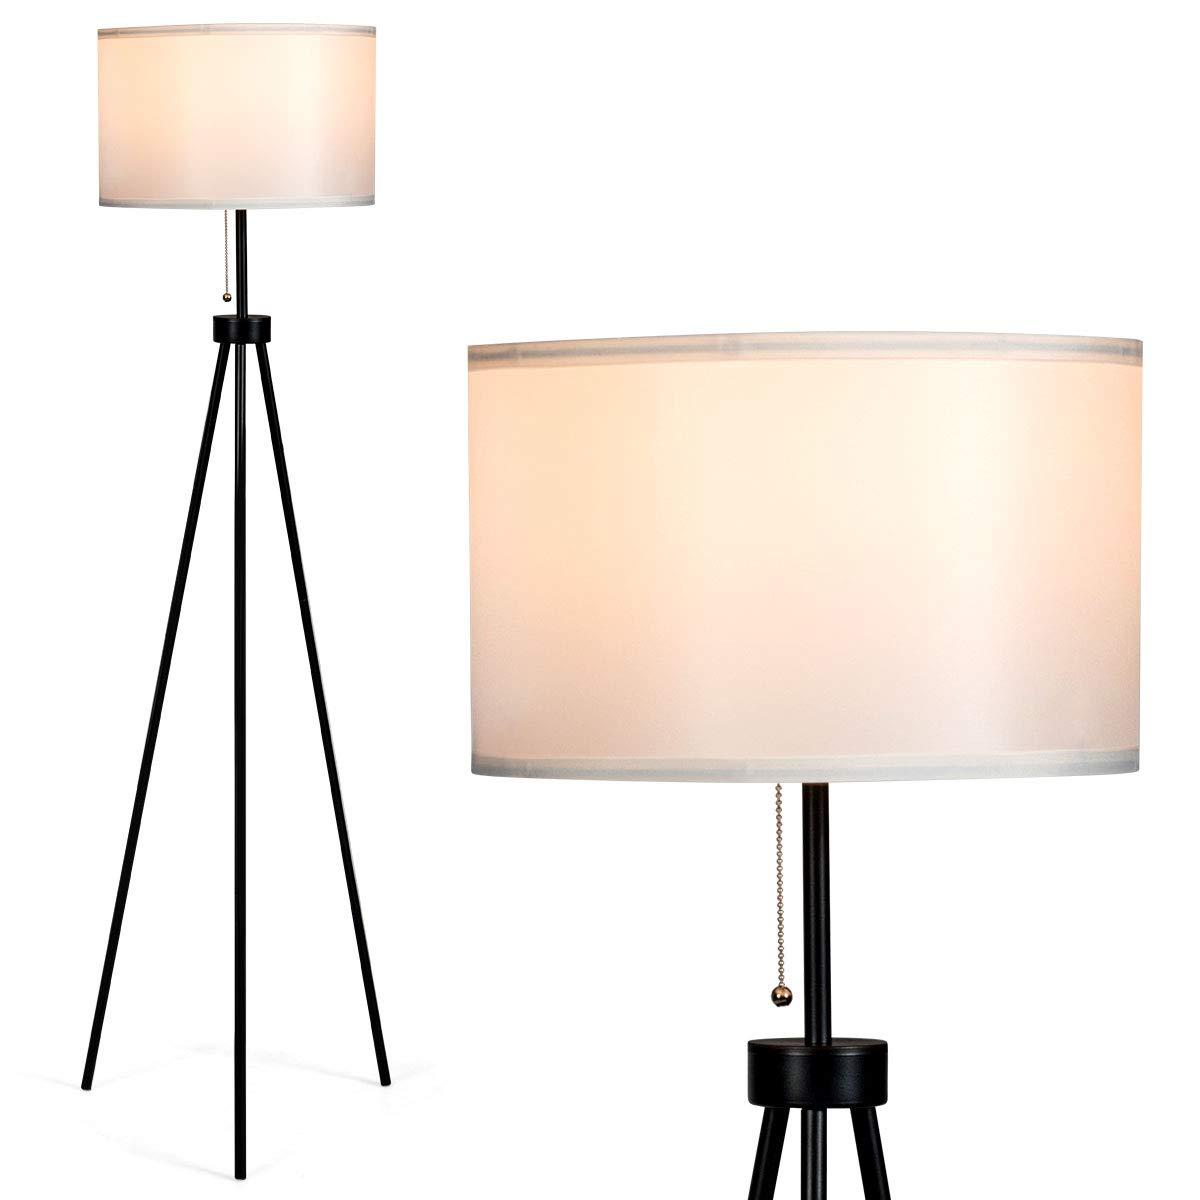 Tangkula 60.5 Metal Tripod Floor Lamp, Contemporary Minimalist Standing Floor Light with Iron Legs, Fabric Drum Shade, E26 Lamp Base, Mid Century Modern Reading Light for Living Room, Bedroom